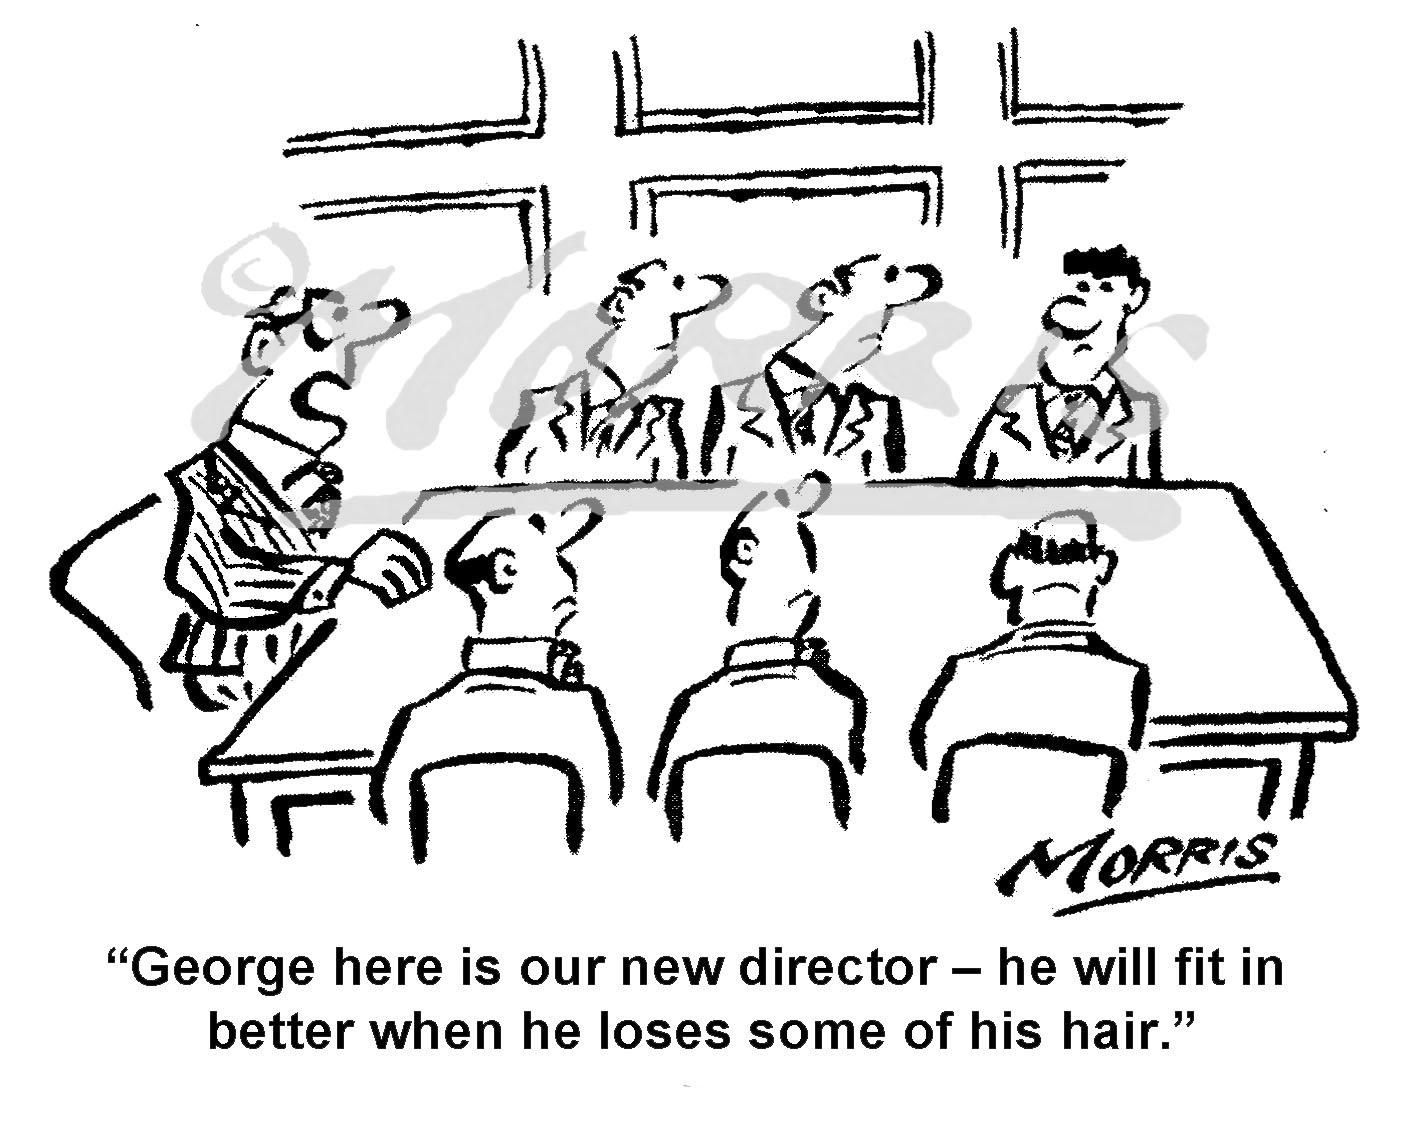 Boardroom director cartoon – Ref: 7615bw